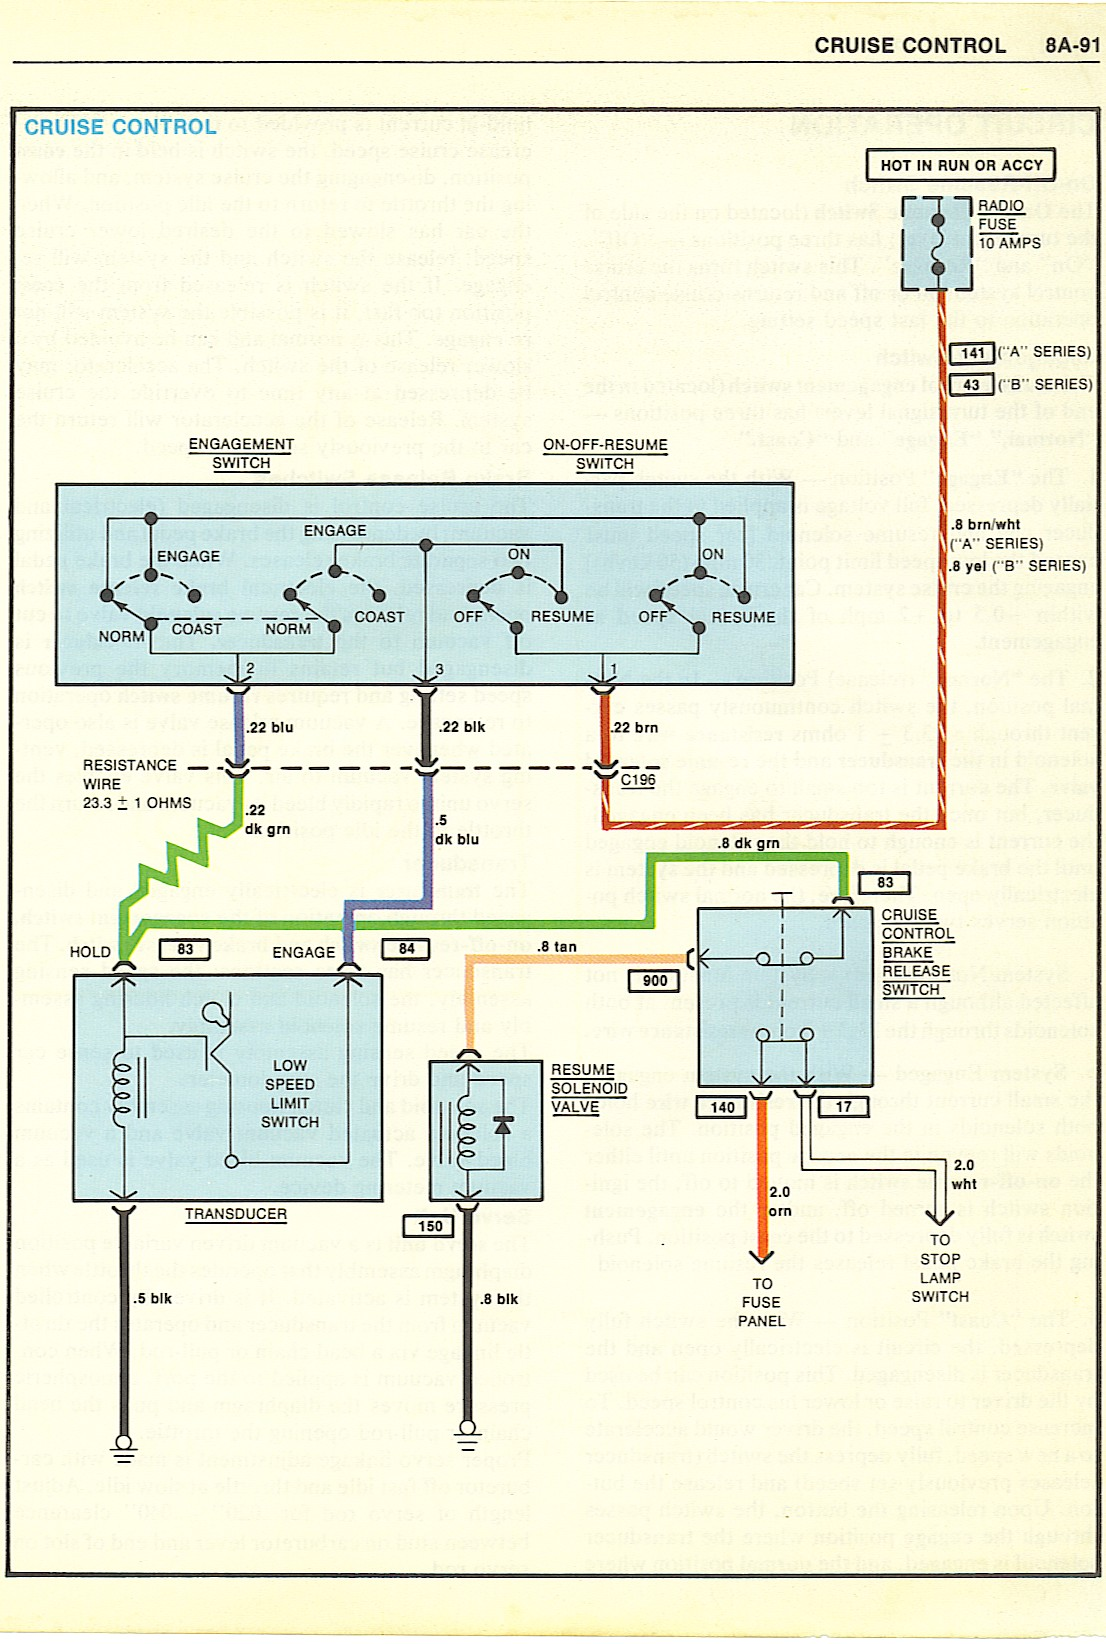 1990 chevy truck headlight wiring diagram ra 2589  gm cruise control diagram free diagram  ra 2589  gm cruise control diagram free